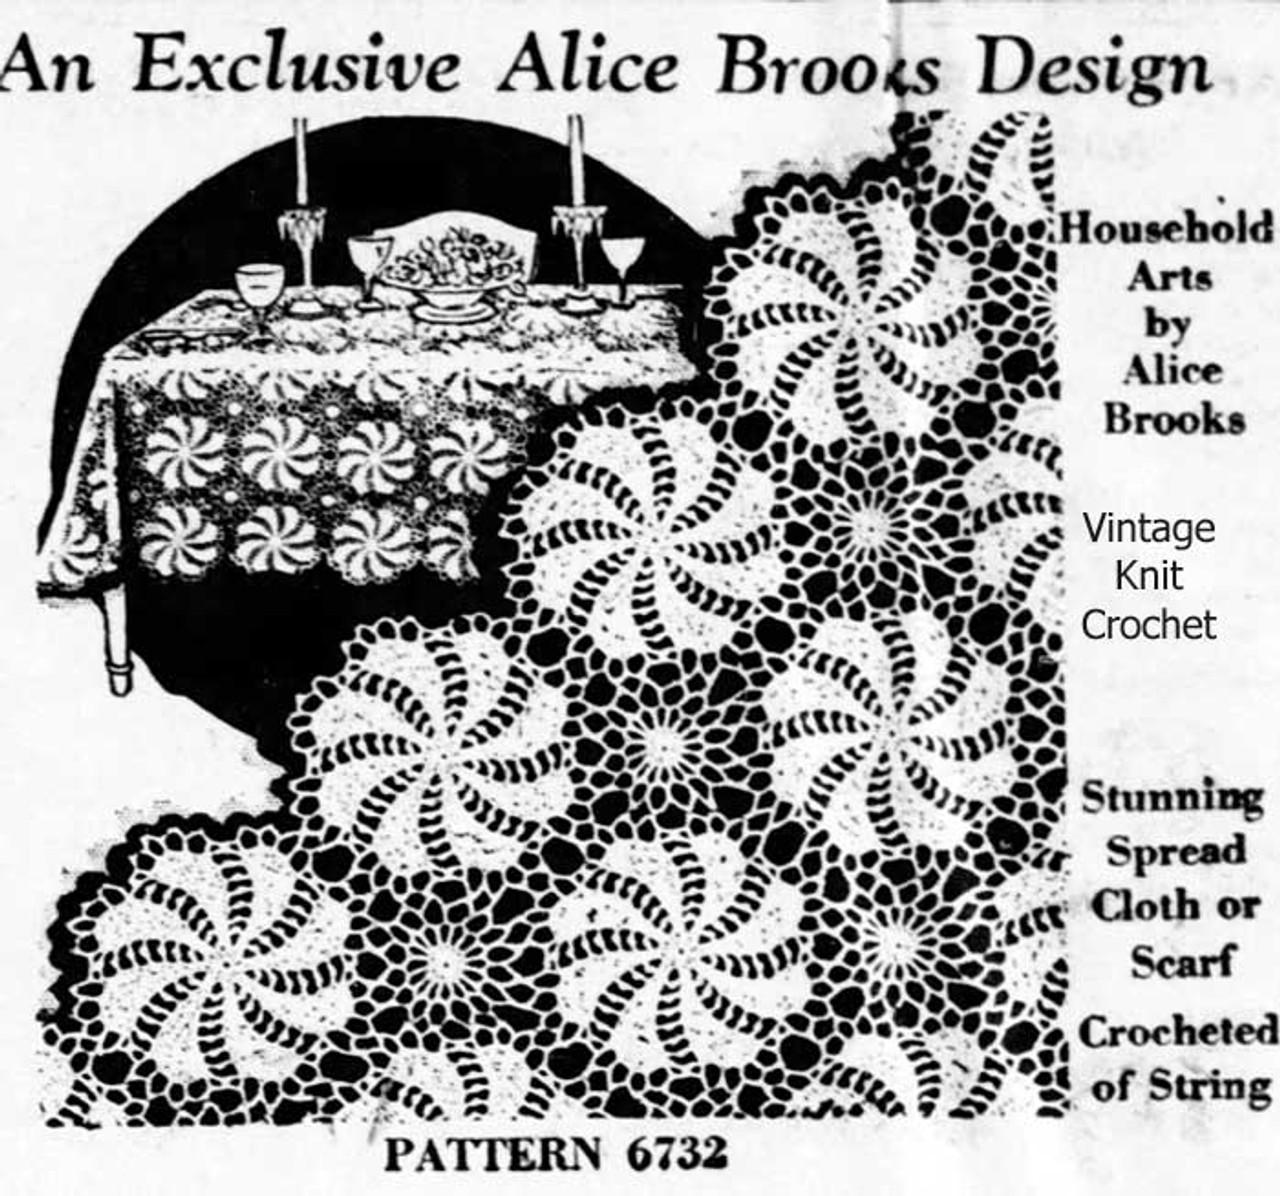 Vintage Pinwheel Crochet Medallion Pattern, Alice Brooks 6732